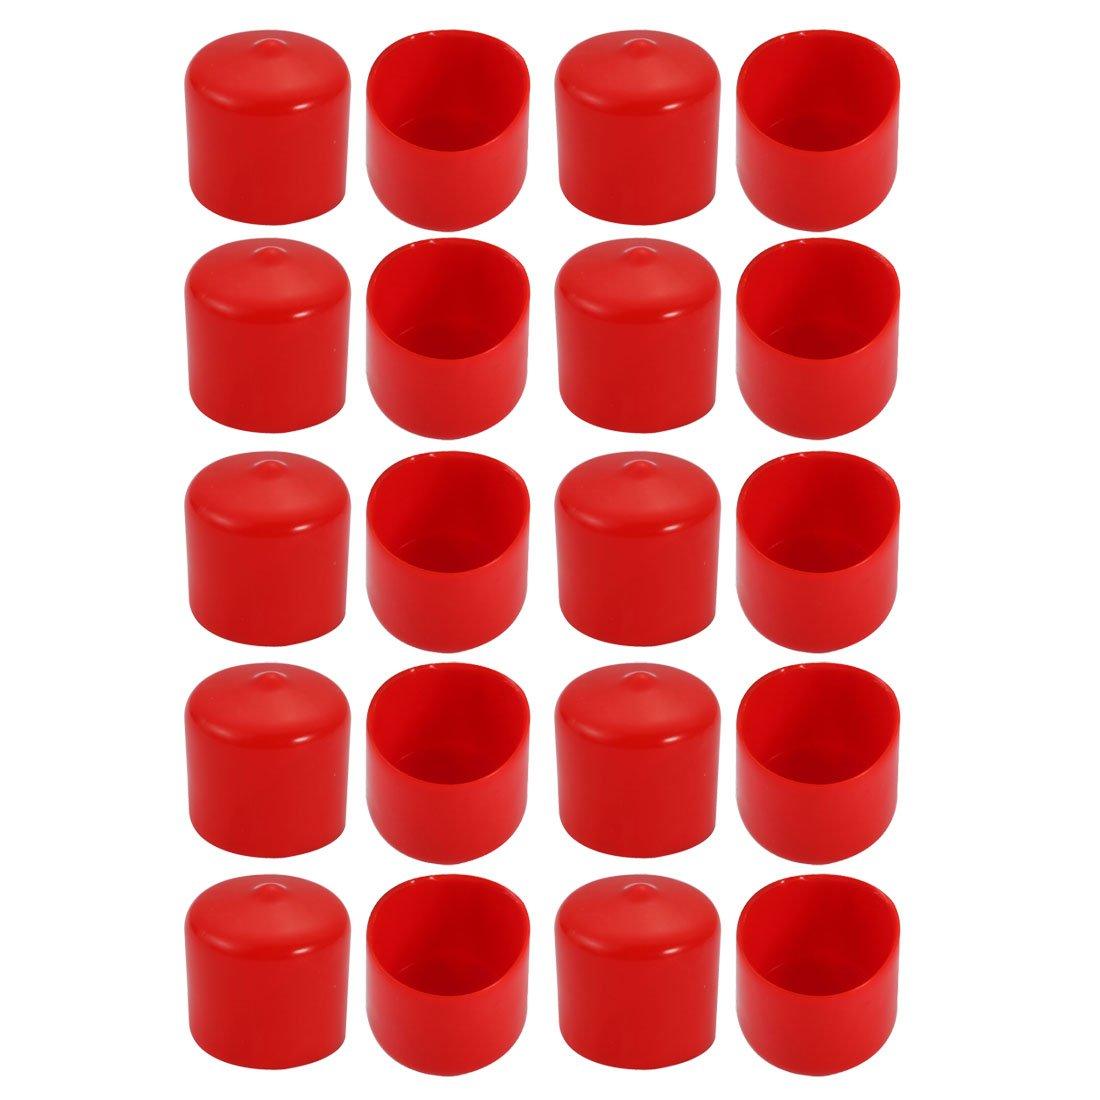 uxcell 20Pcs 25mm Inner Dia PVC Flexible Vinyl End Cap Screw Thread Protector Cover Red